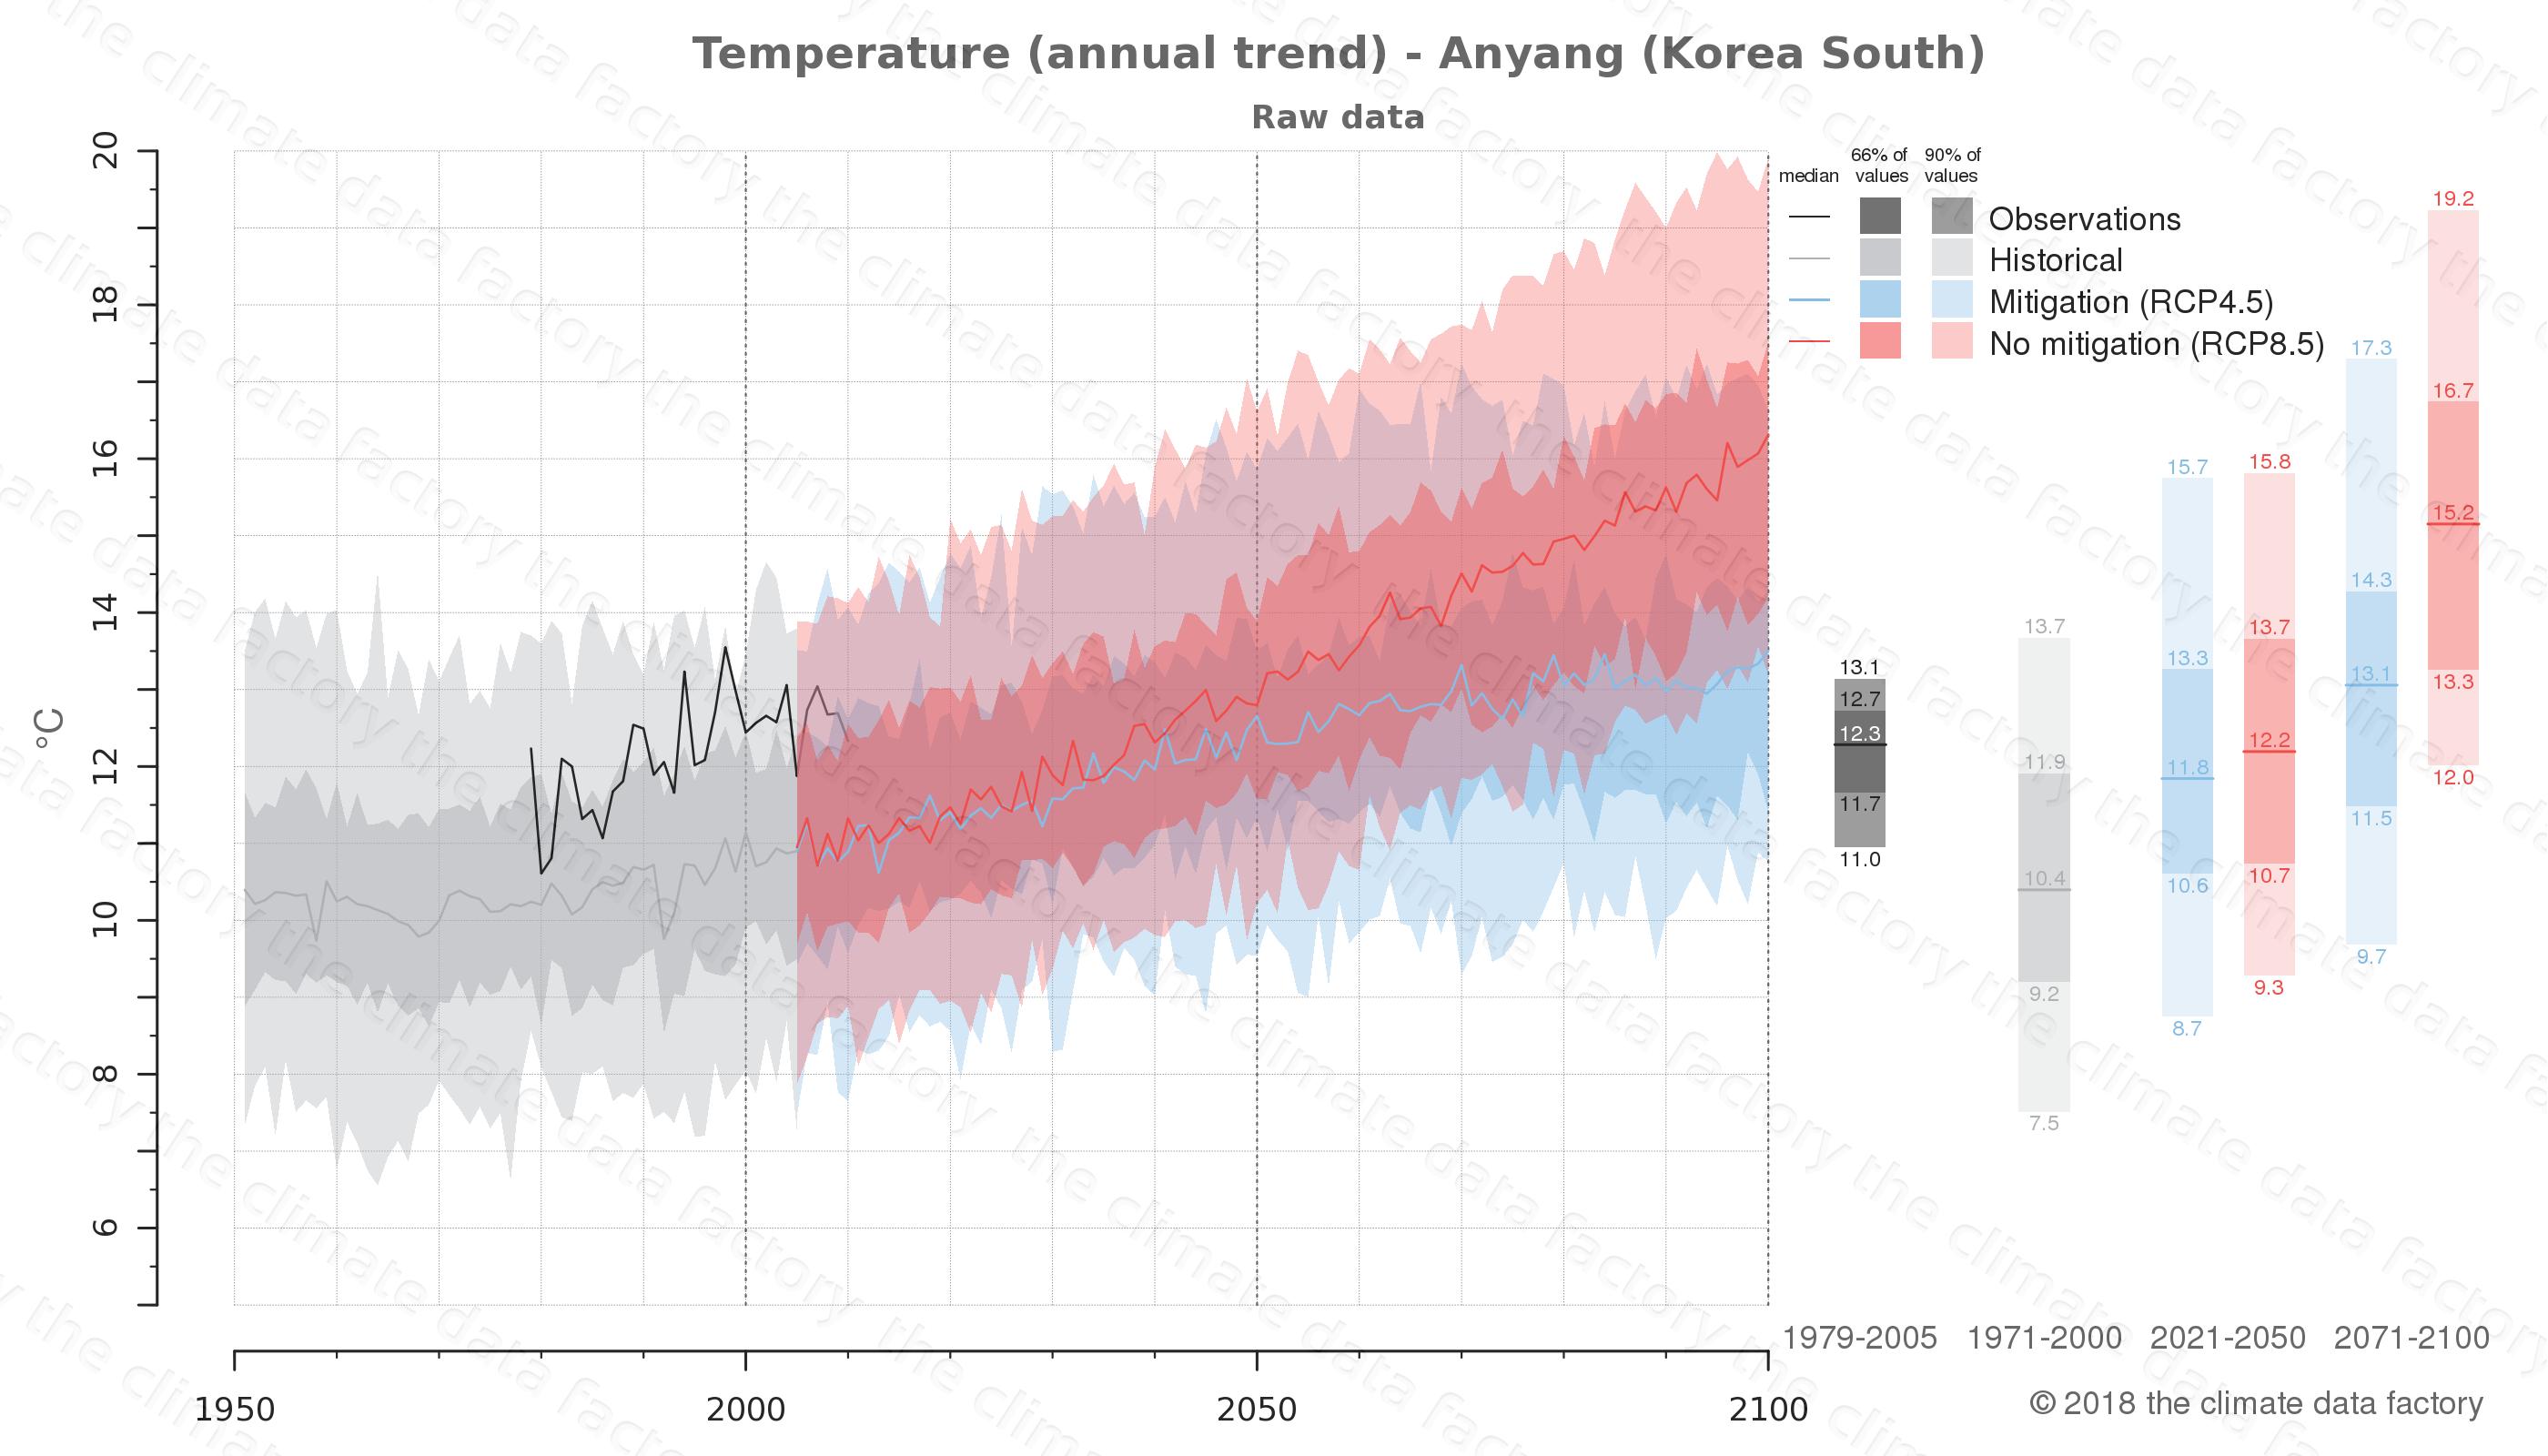 climate change data policy adaptation climate graph city data temperature anyang south korea